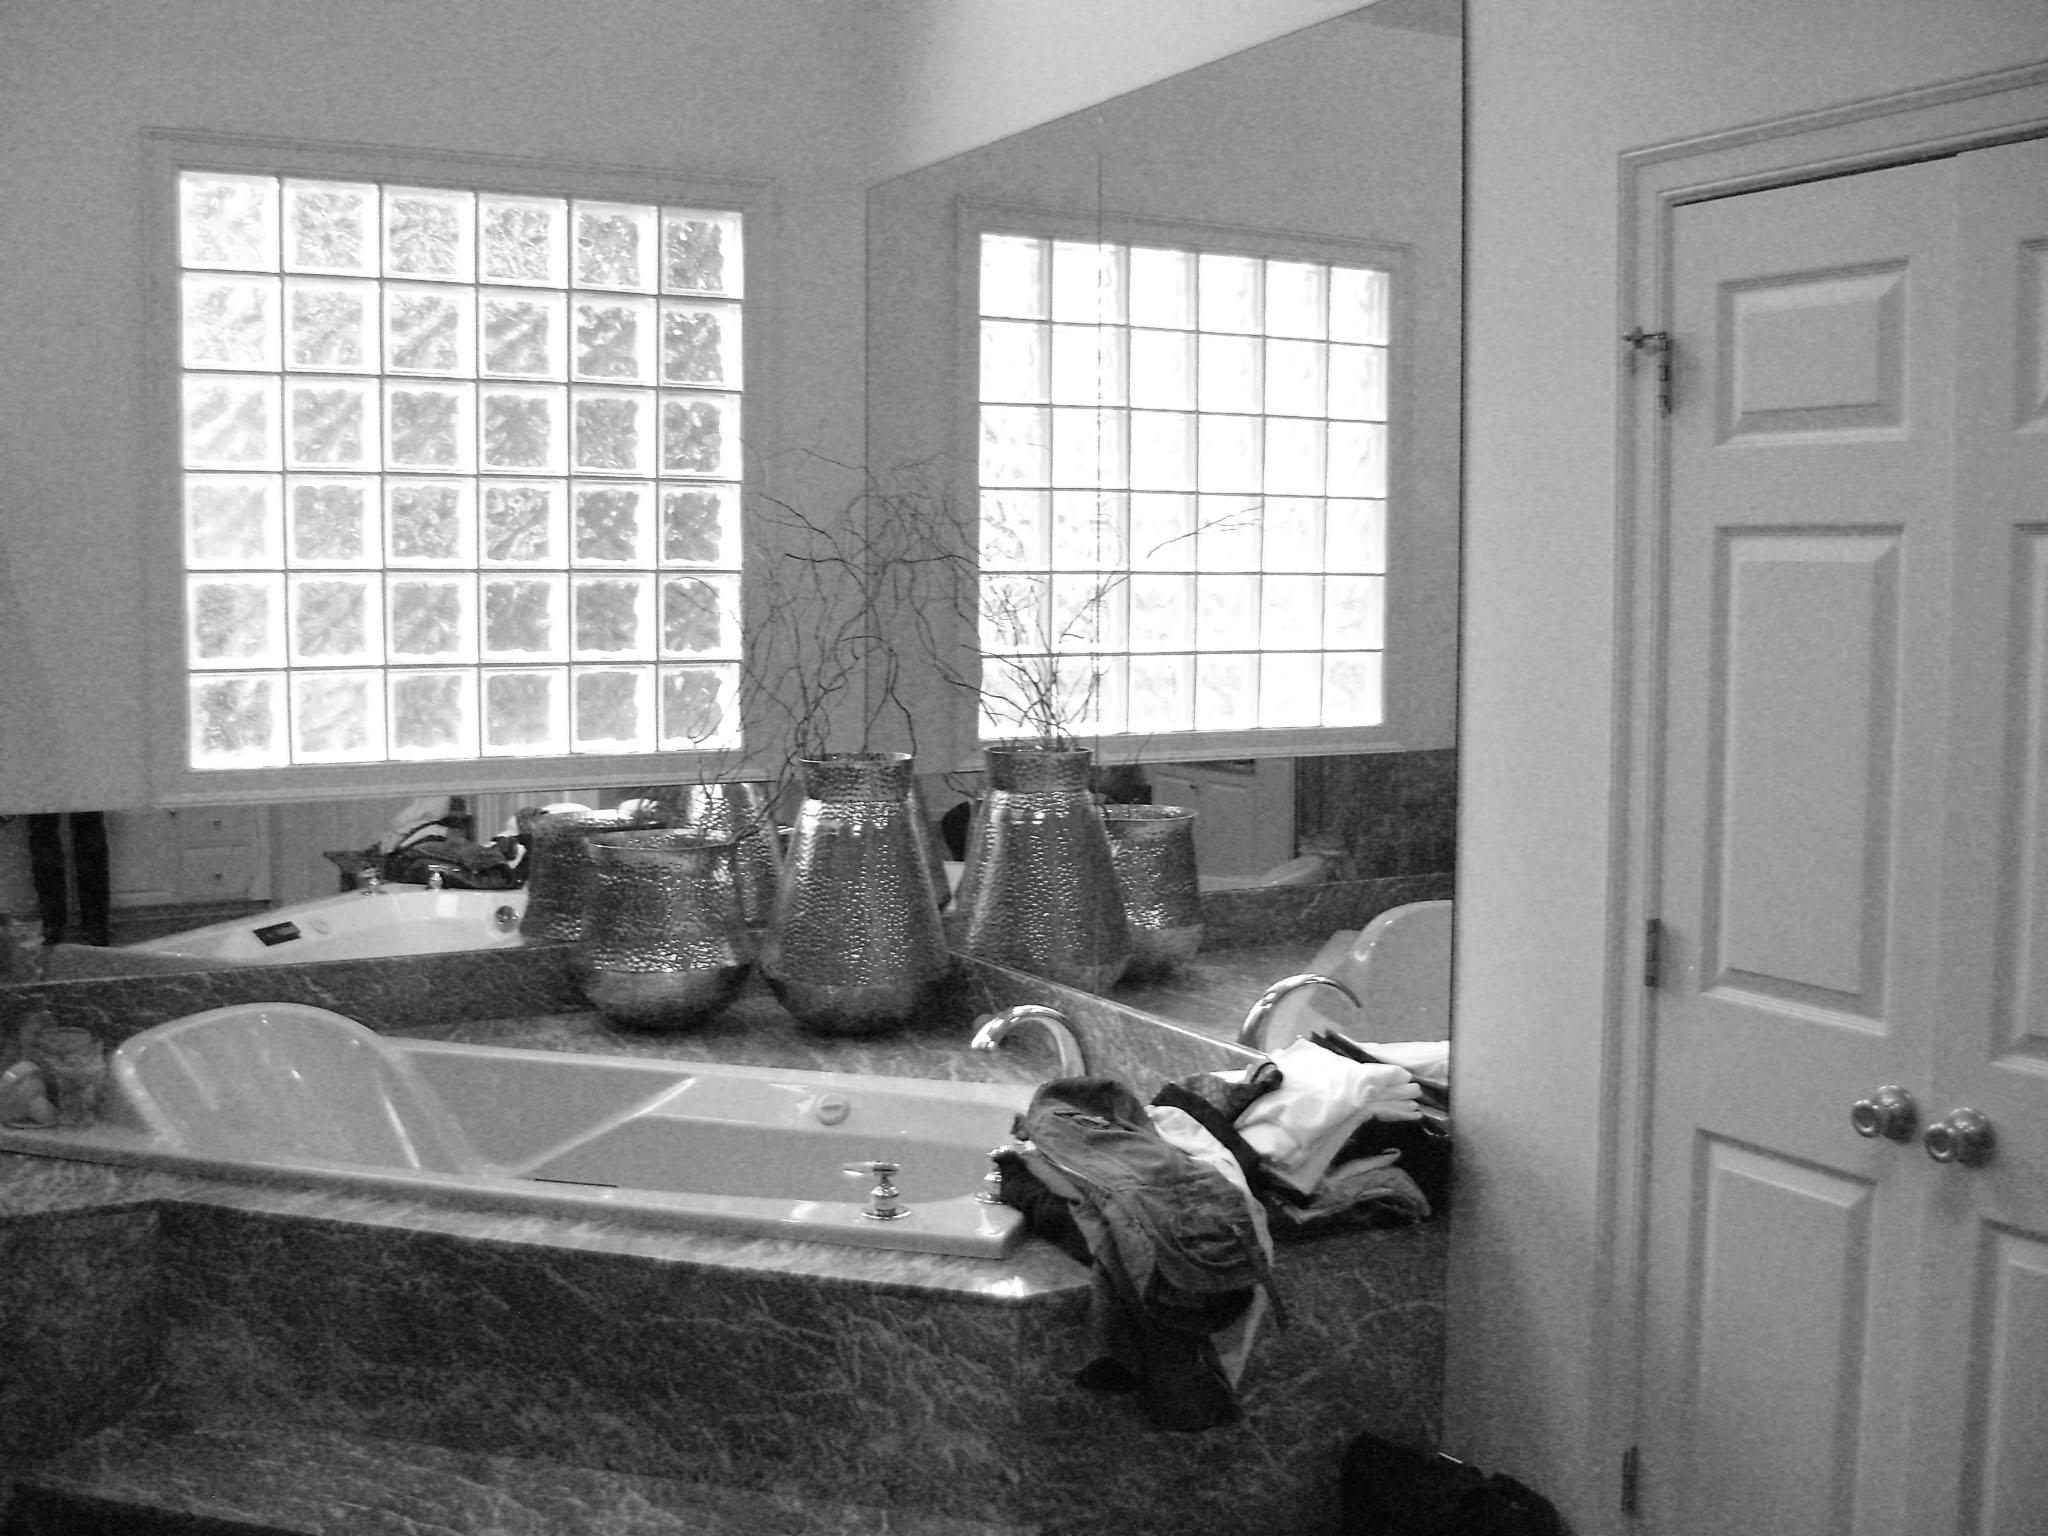 bath1-bw.jpg